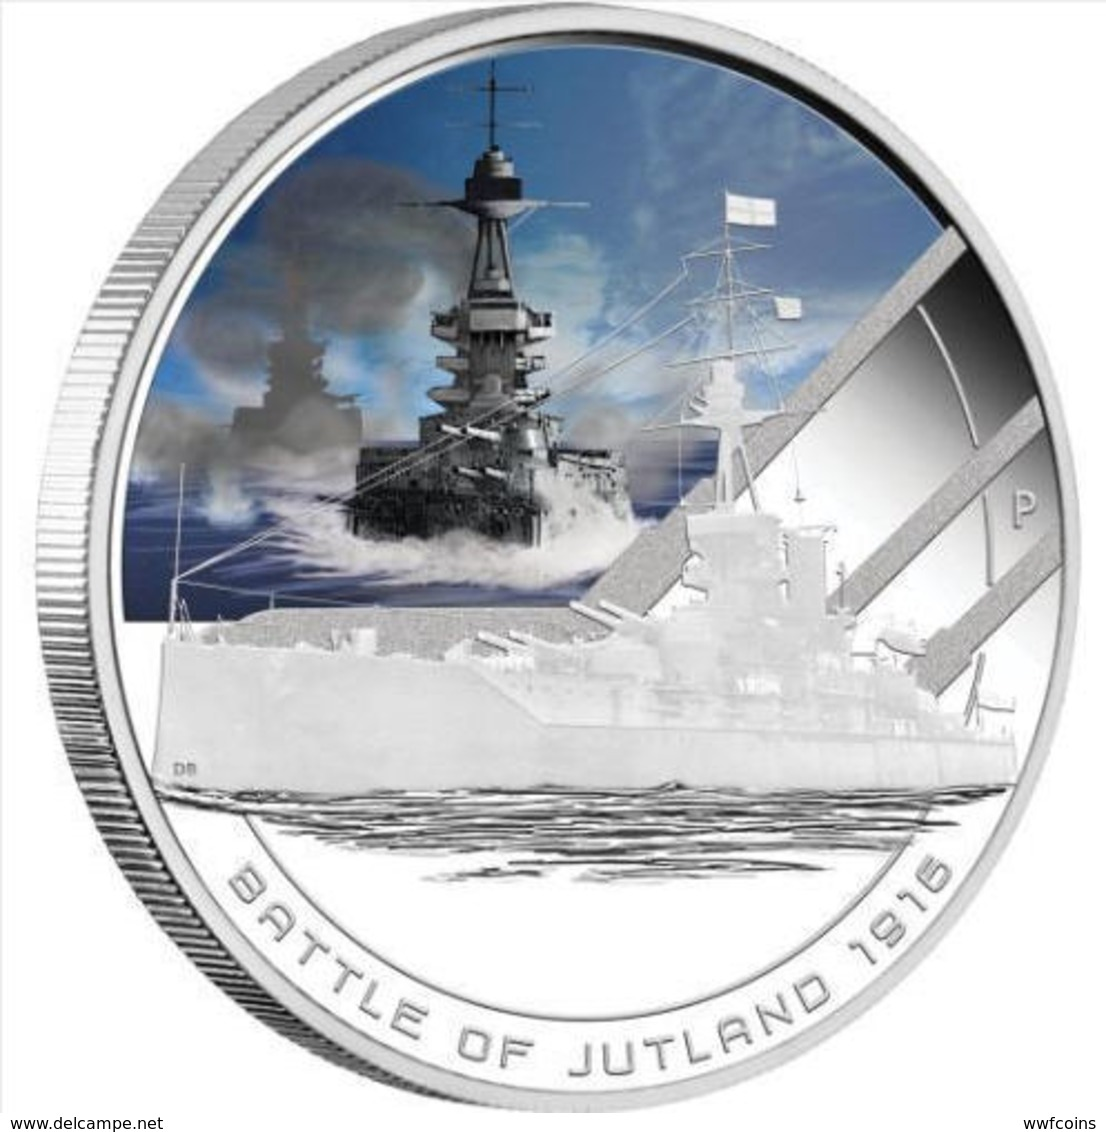 COOK ISLANDS 1 $ 2011 SILVER 999 Oz FAMOUS NAVAL BRITAIN'S BATTLESHIP JUTLAND 1916 WEIGHT 31,135g TITOLO 0,999 CONSERVAZ - Cook